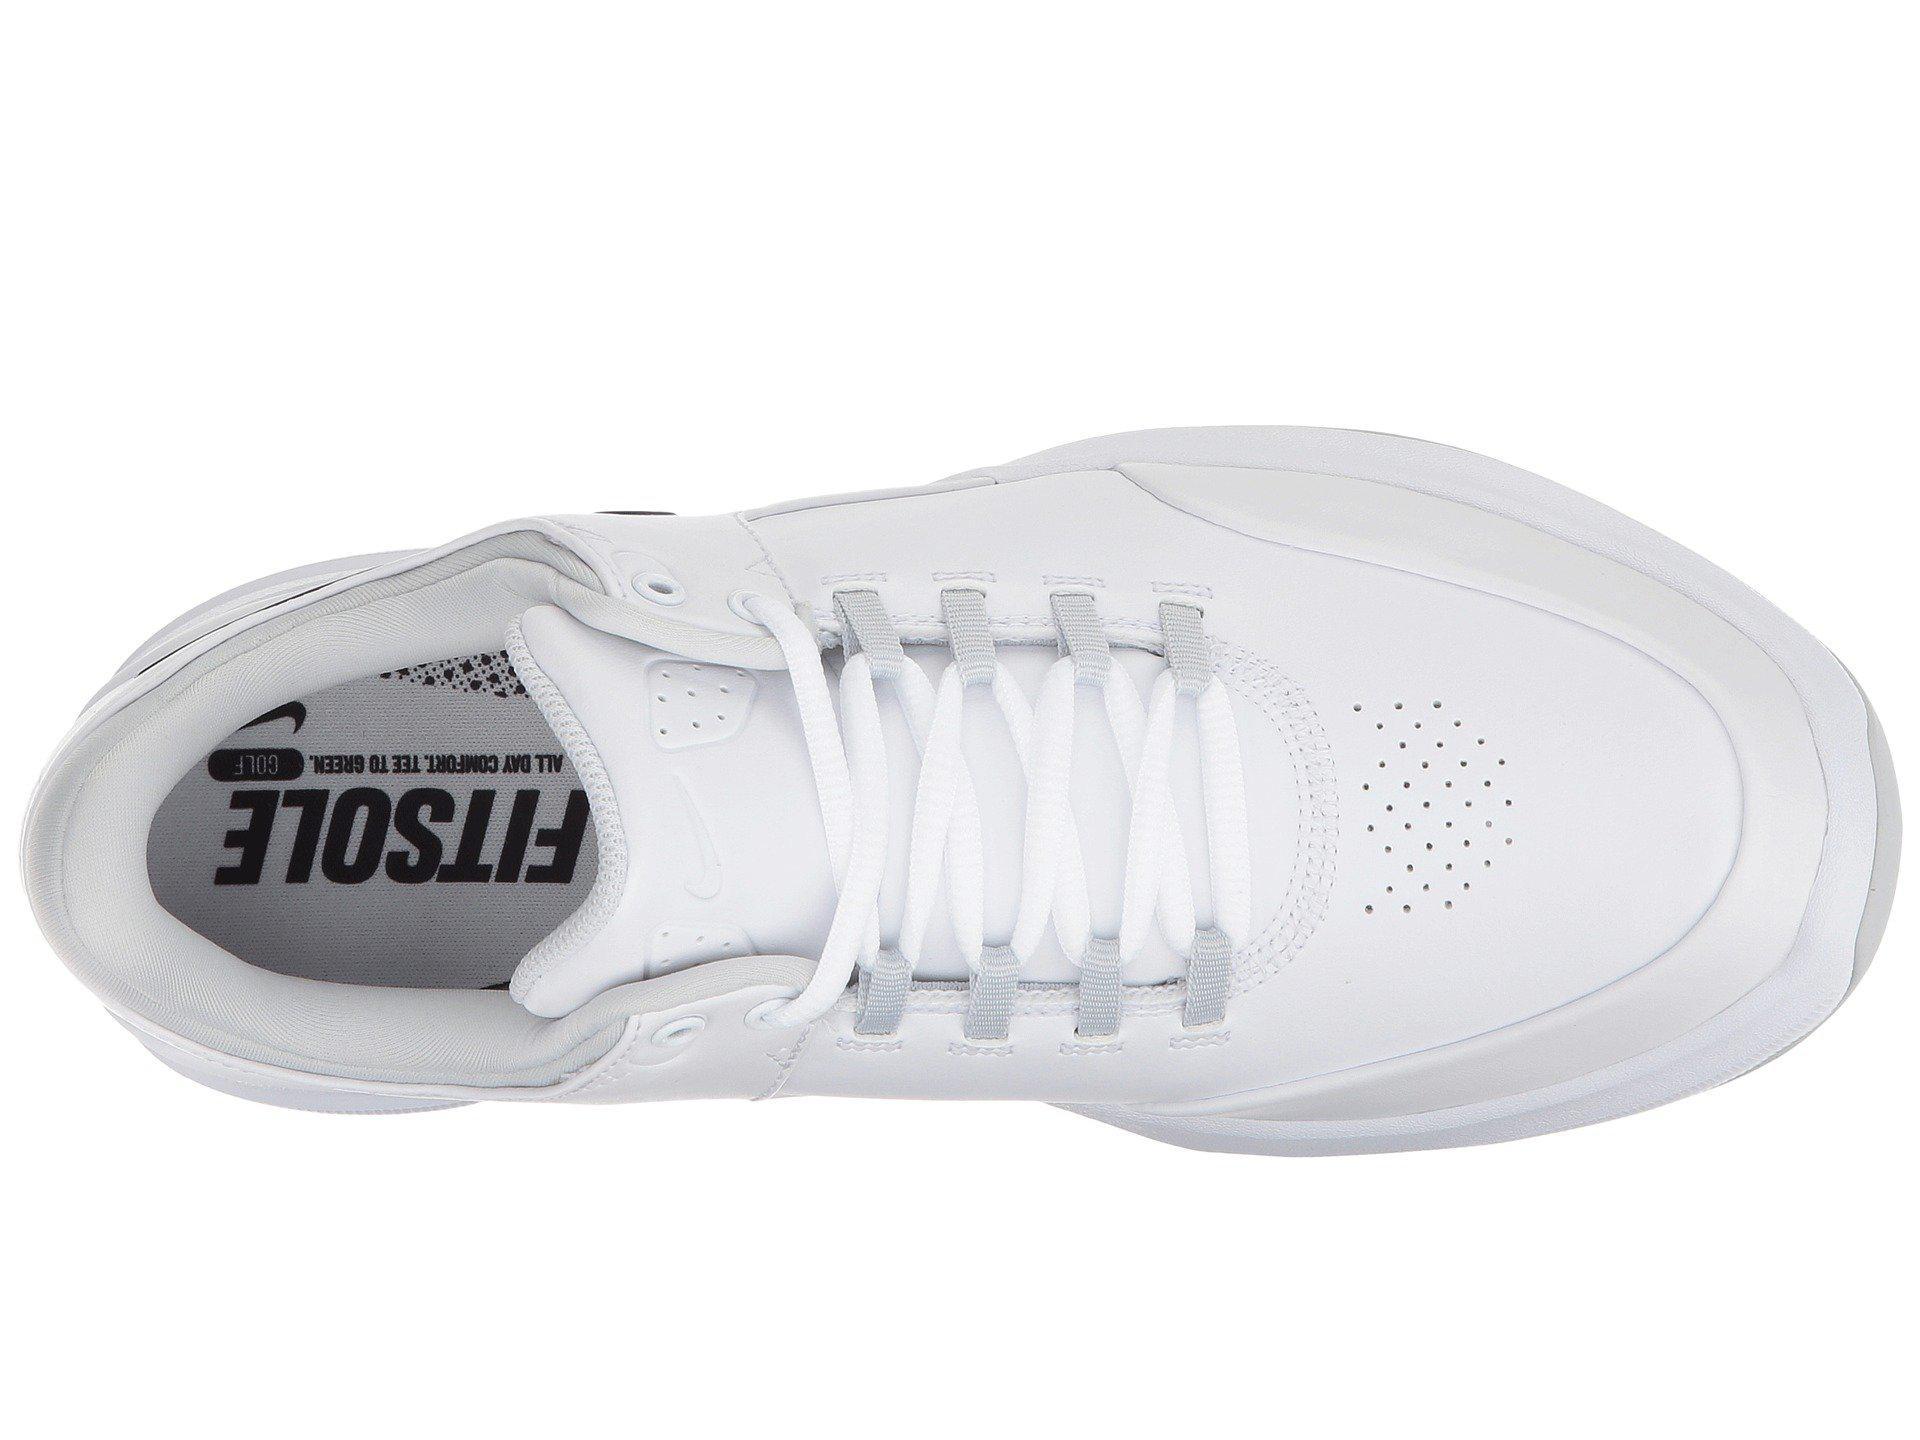 5a6dec6c99853 nike-WhiteBlackMetallic-SilverPure-Air-Zoom -Accurate-blackreflect-Silverdark-Grey-Womens-Golf-Shoes.jpeg